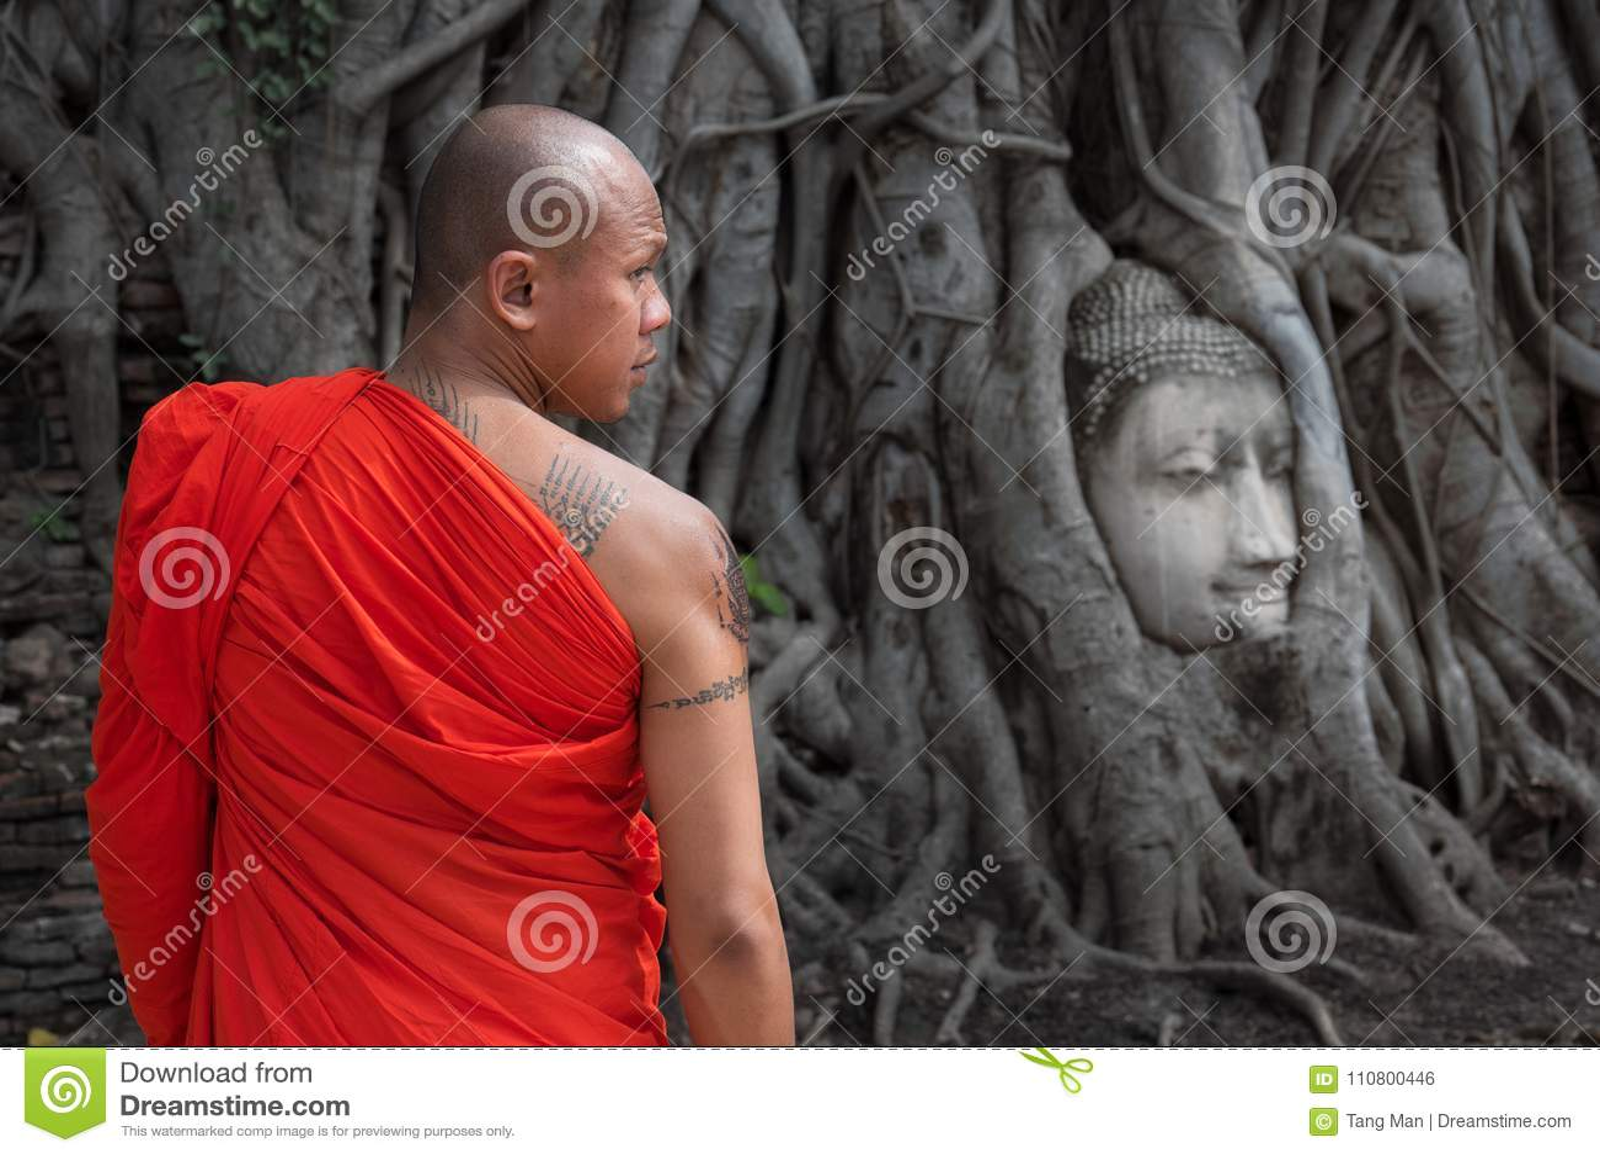 The famous Buddha head at Wat Mahathat in Ayutthaya Historical Park, Thailand.